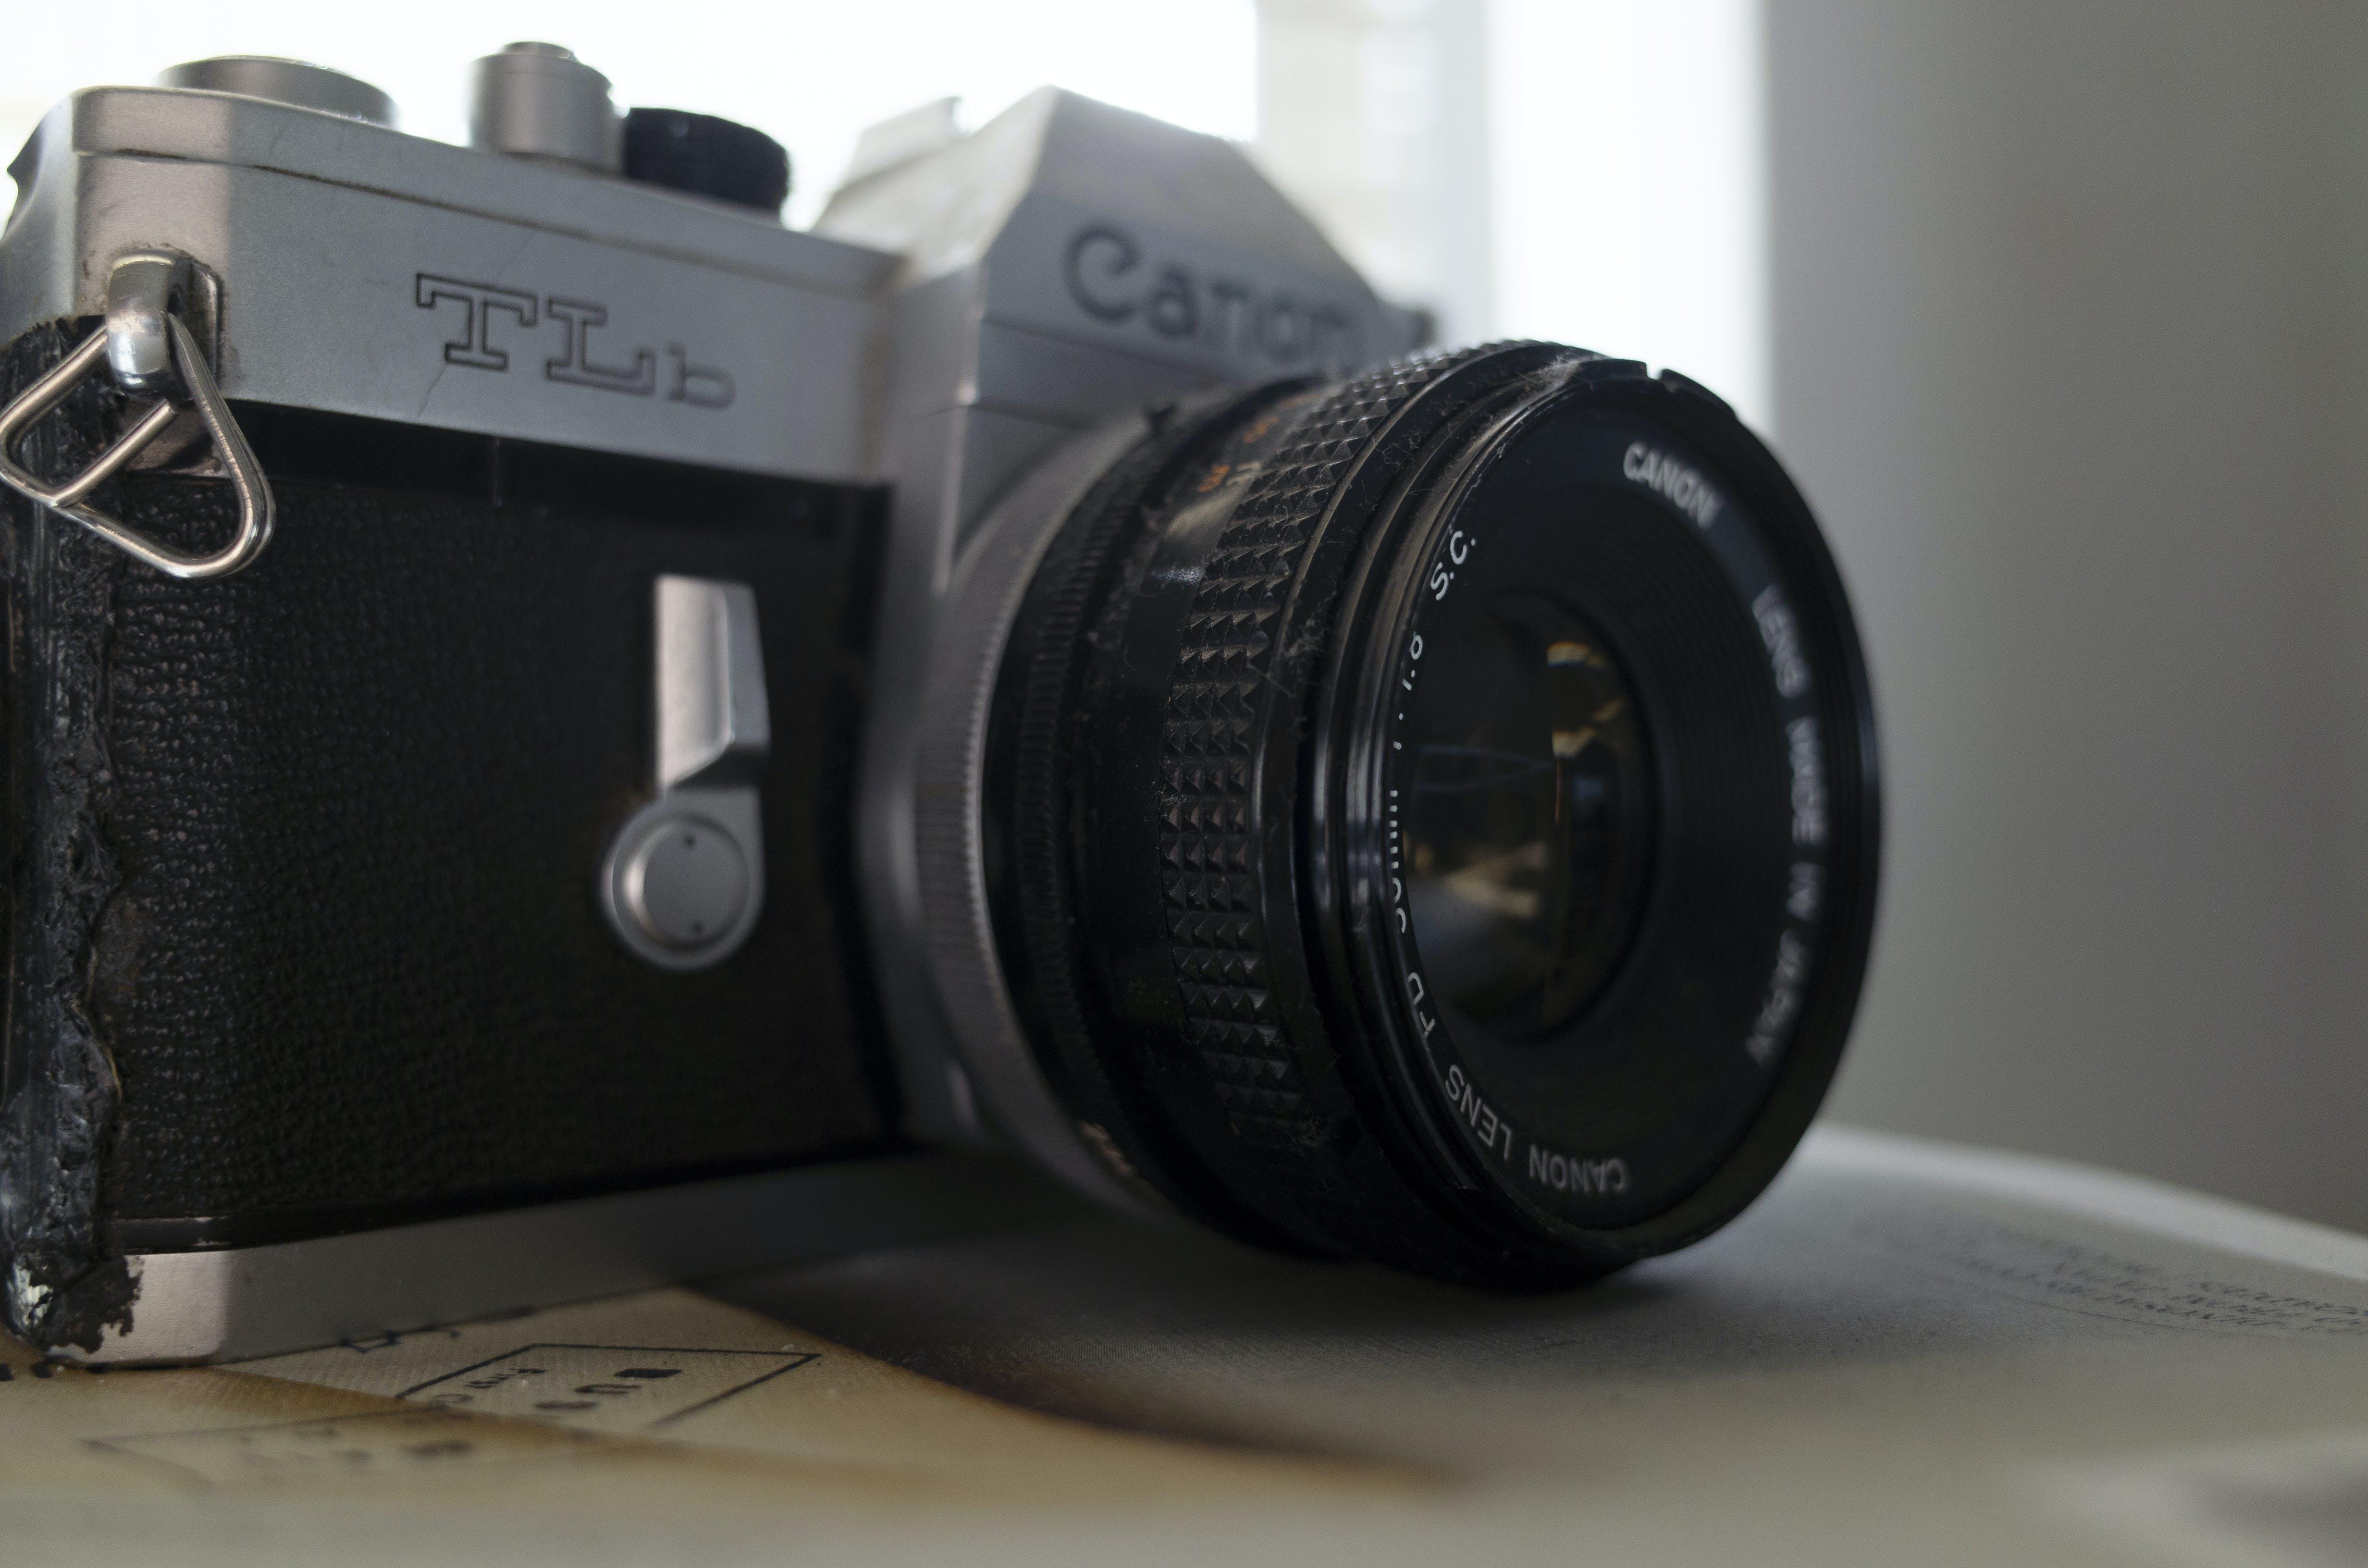 Free stock photo of analog camera, camera, canon, close-up view